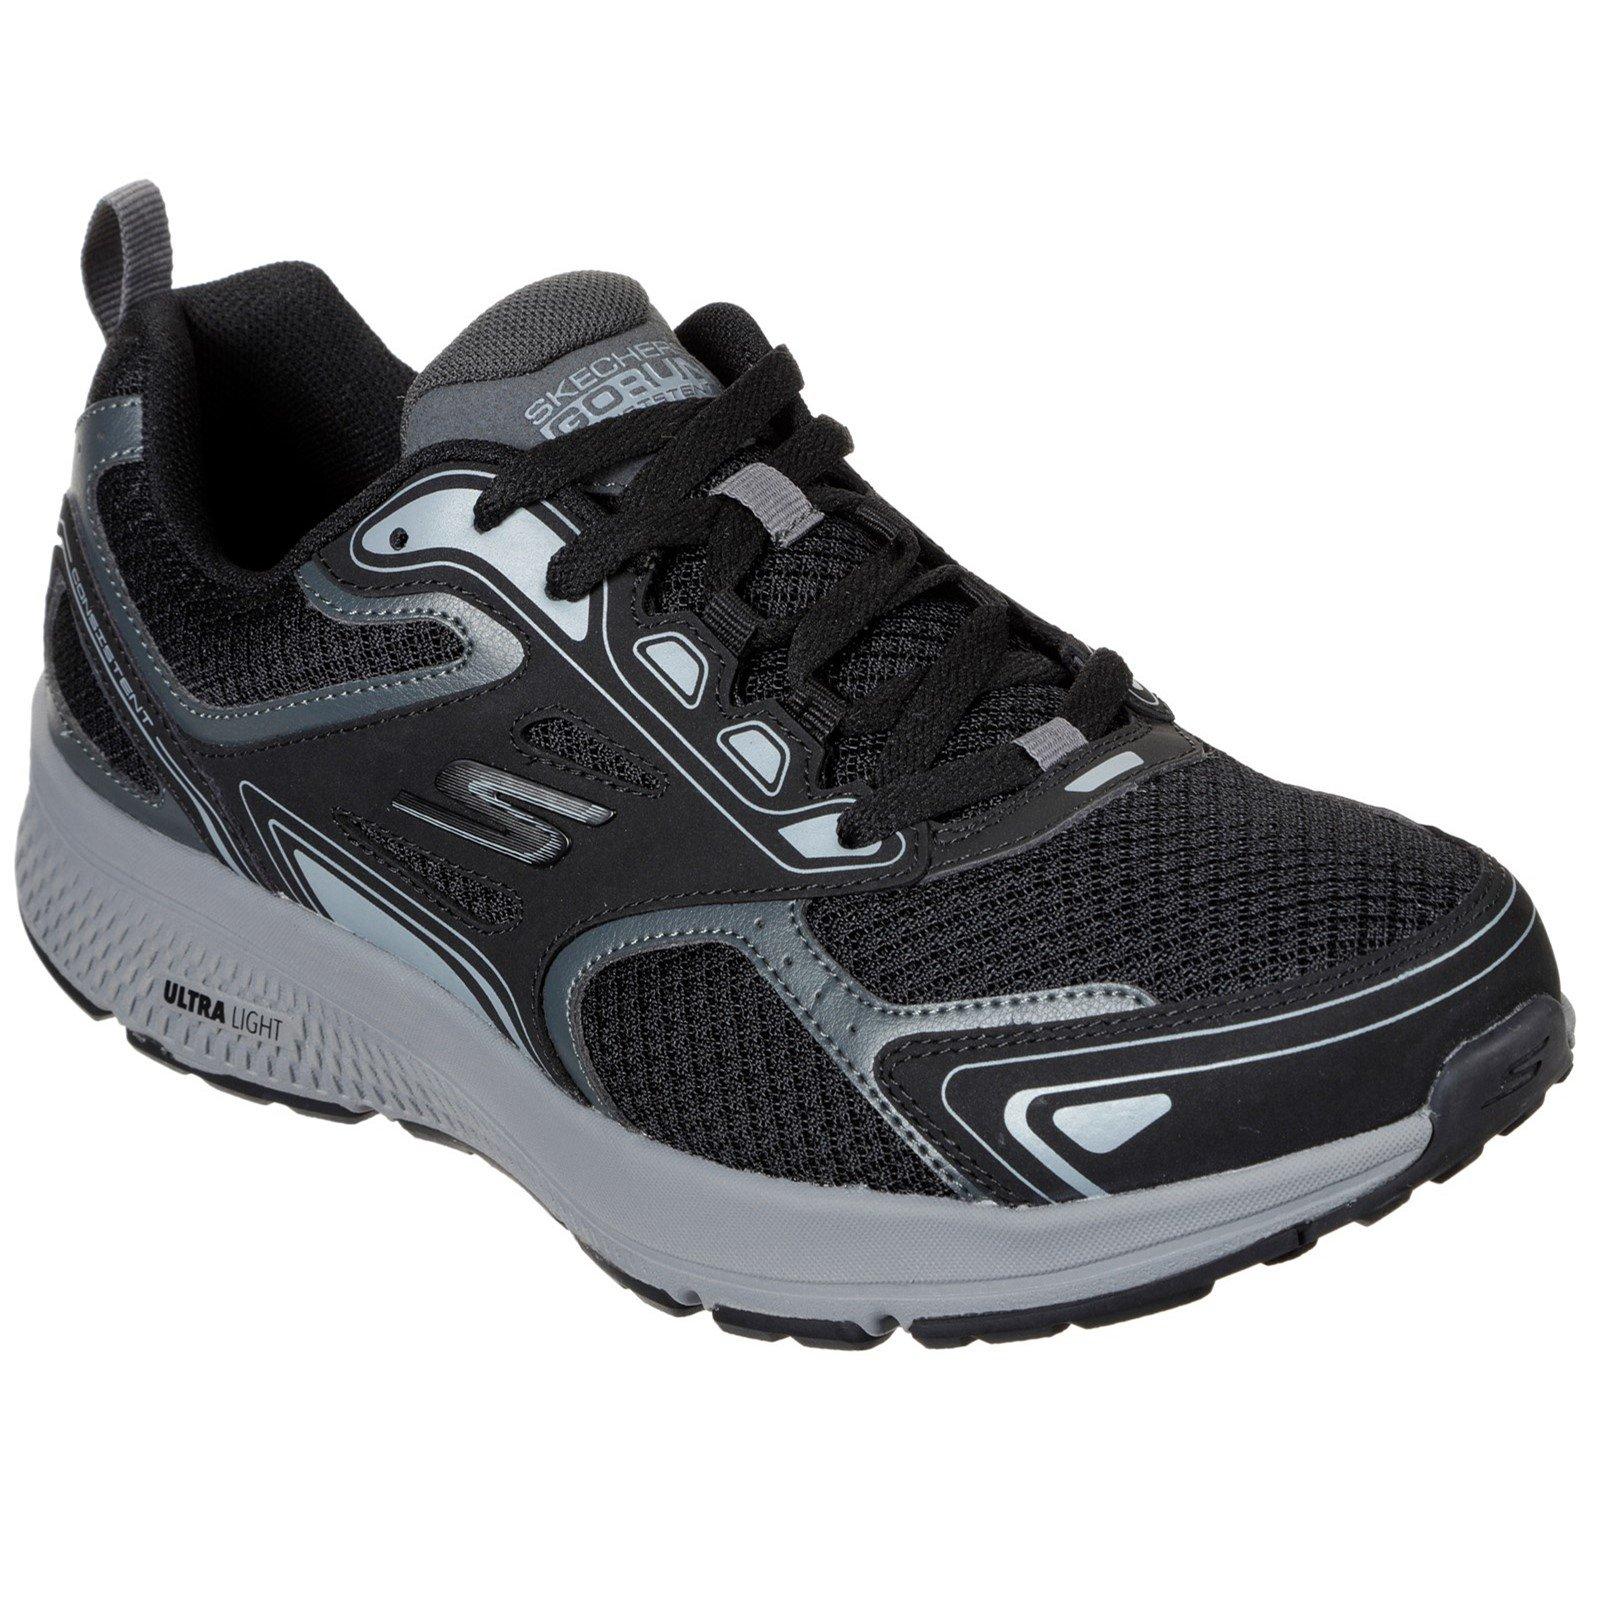 Skechers Men's Go Run Consistent Wide Trainer Multicolor 33072 - Black/Grey 11